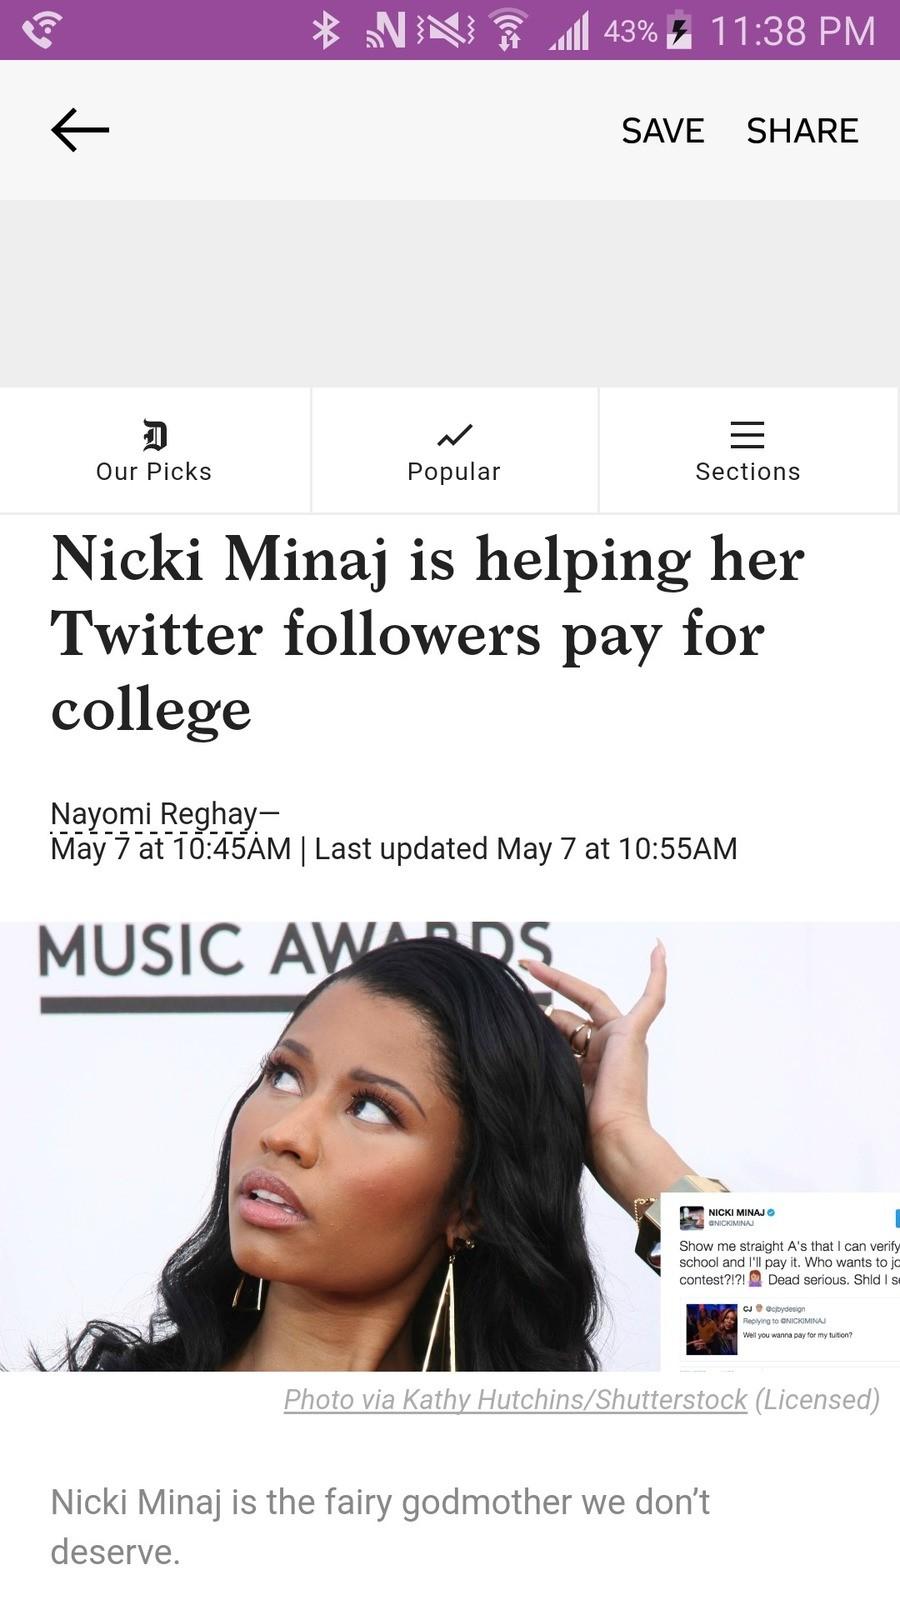 Nicki Minaj 2024. People keep joking about voting for Kanye in 8 years, but I don't see him giving anyone free college. Jokes aside, this was really nice of her nicki minaj College News